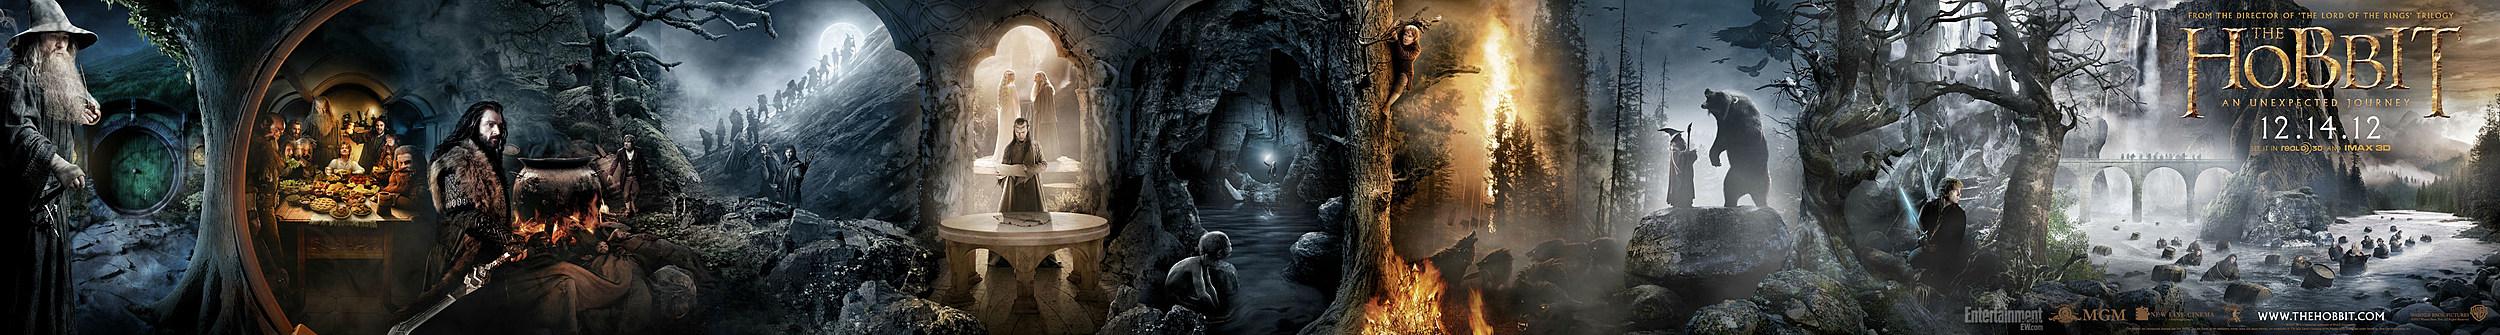 The Hobbit poster banner